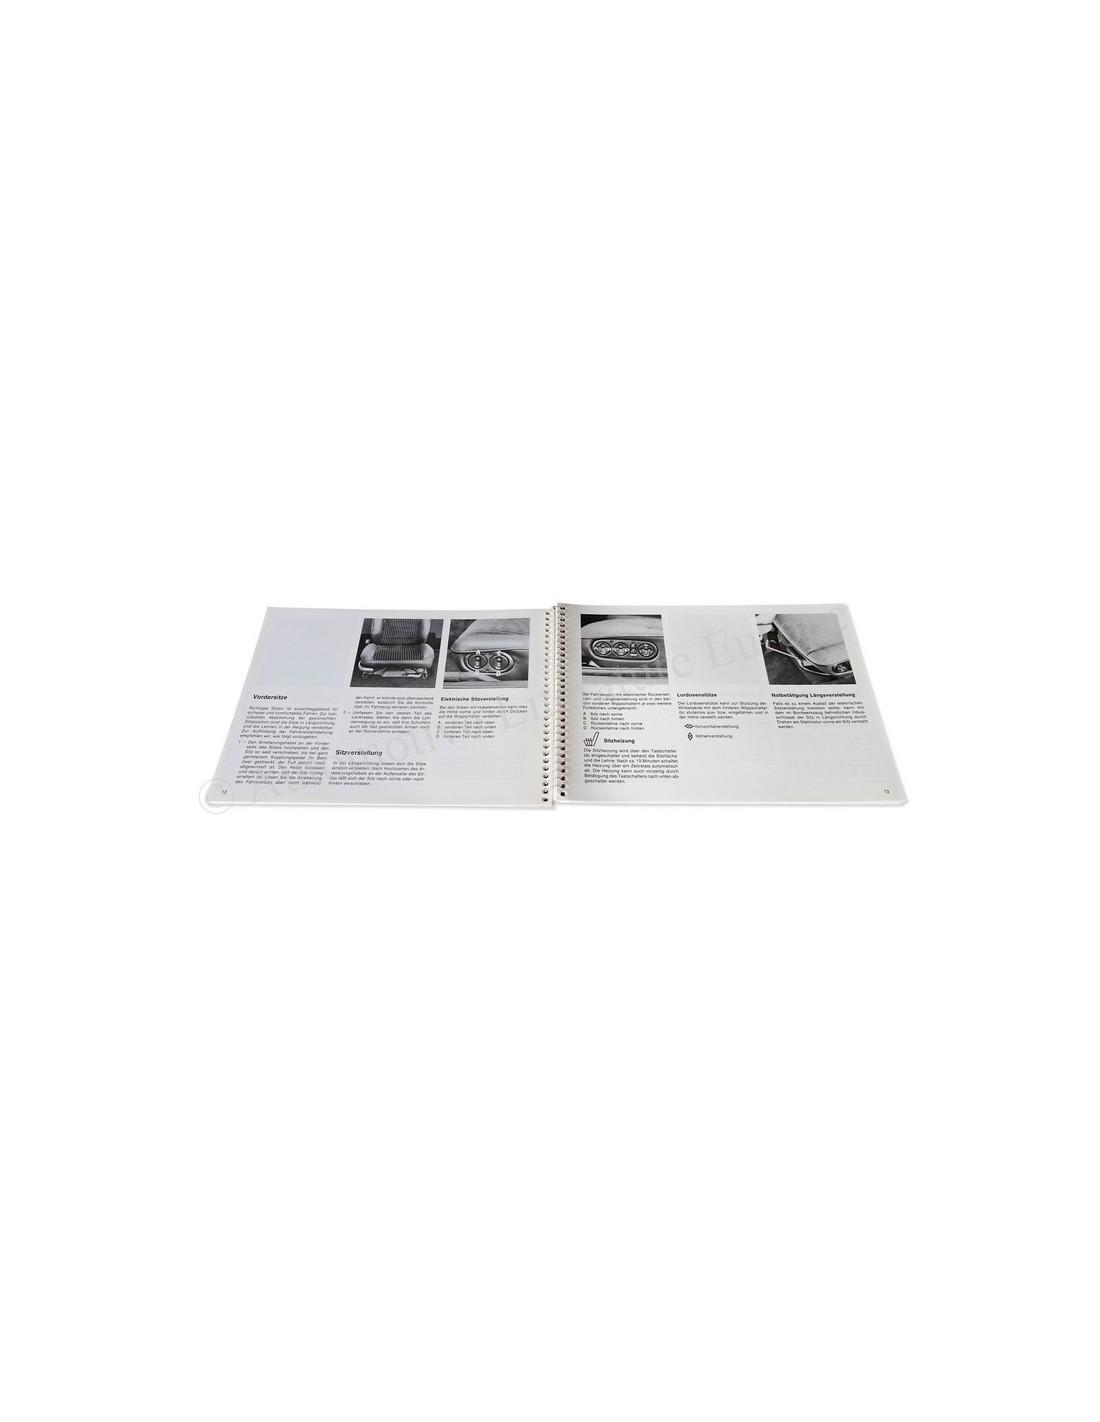 service manual 1987 porsche 944 owners manual download. Black Bedroom Furniture Sets. Home Design Ideas